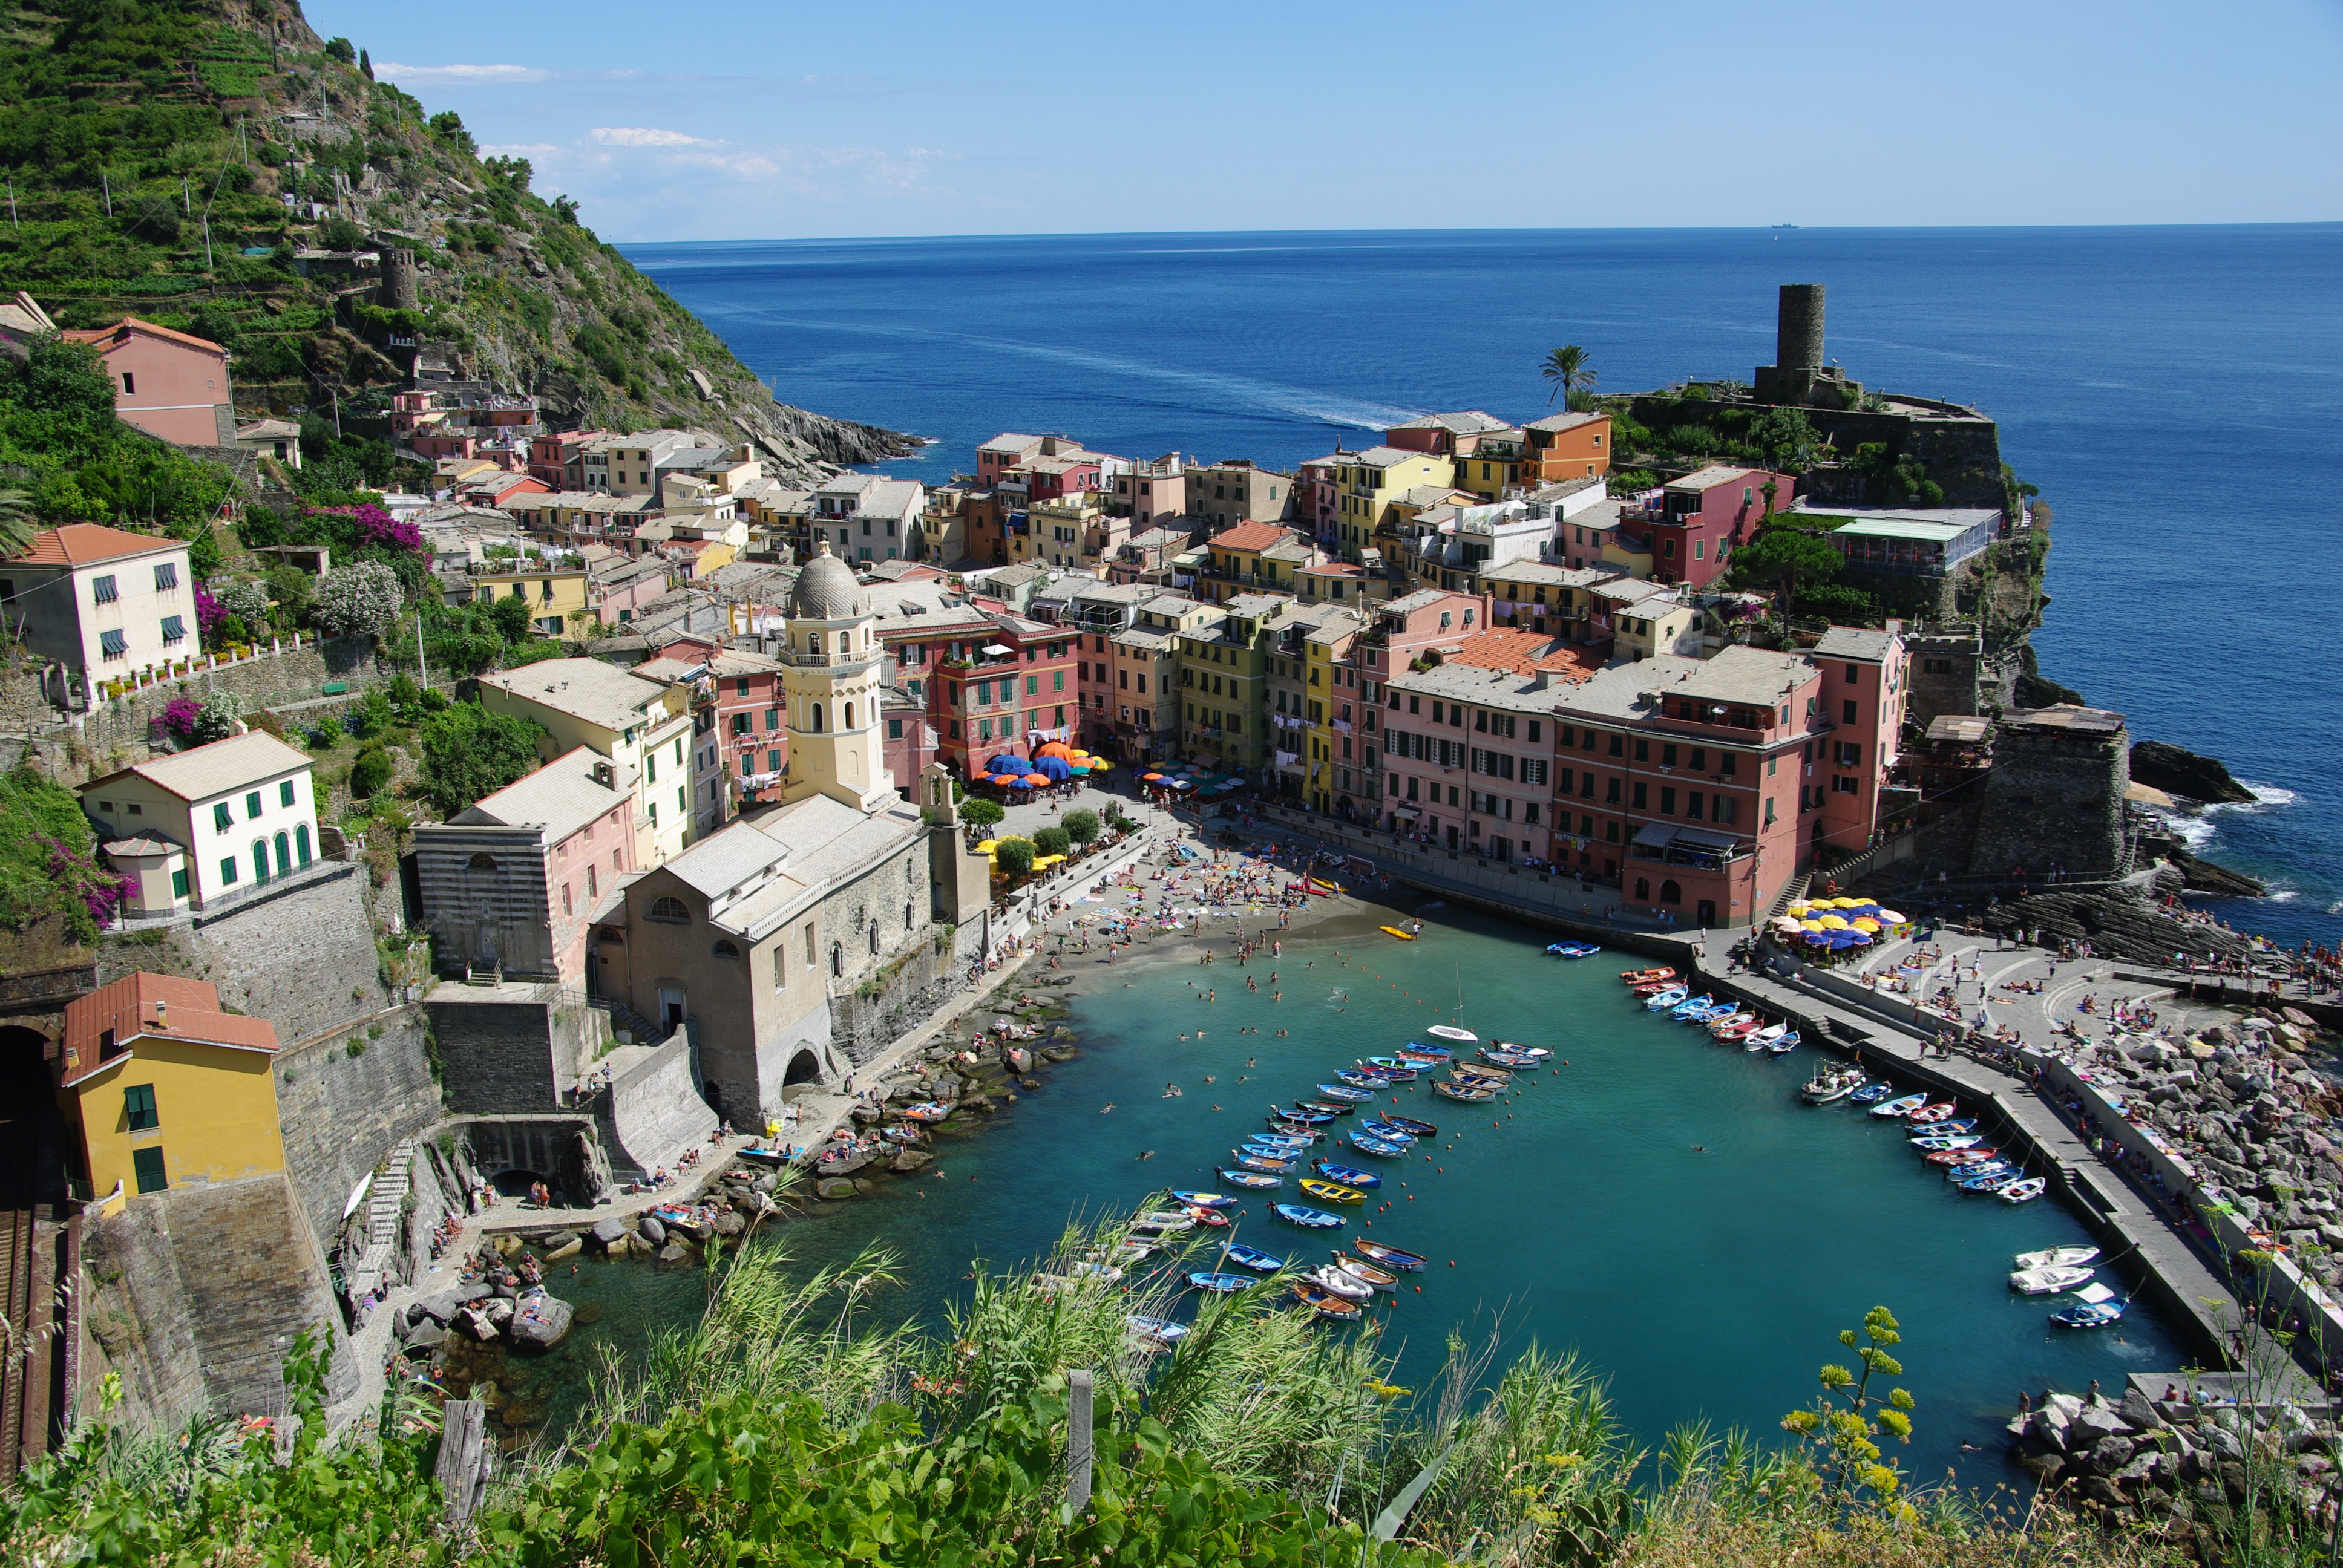 Hotel Marina Cinque Terre